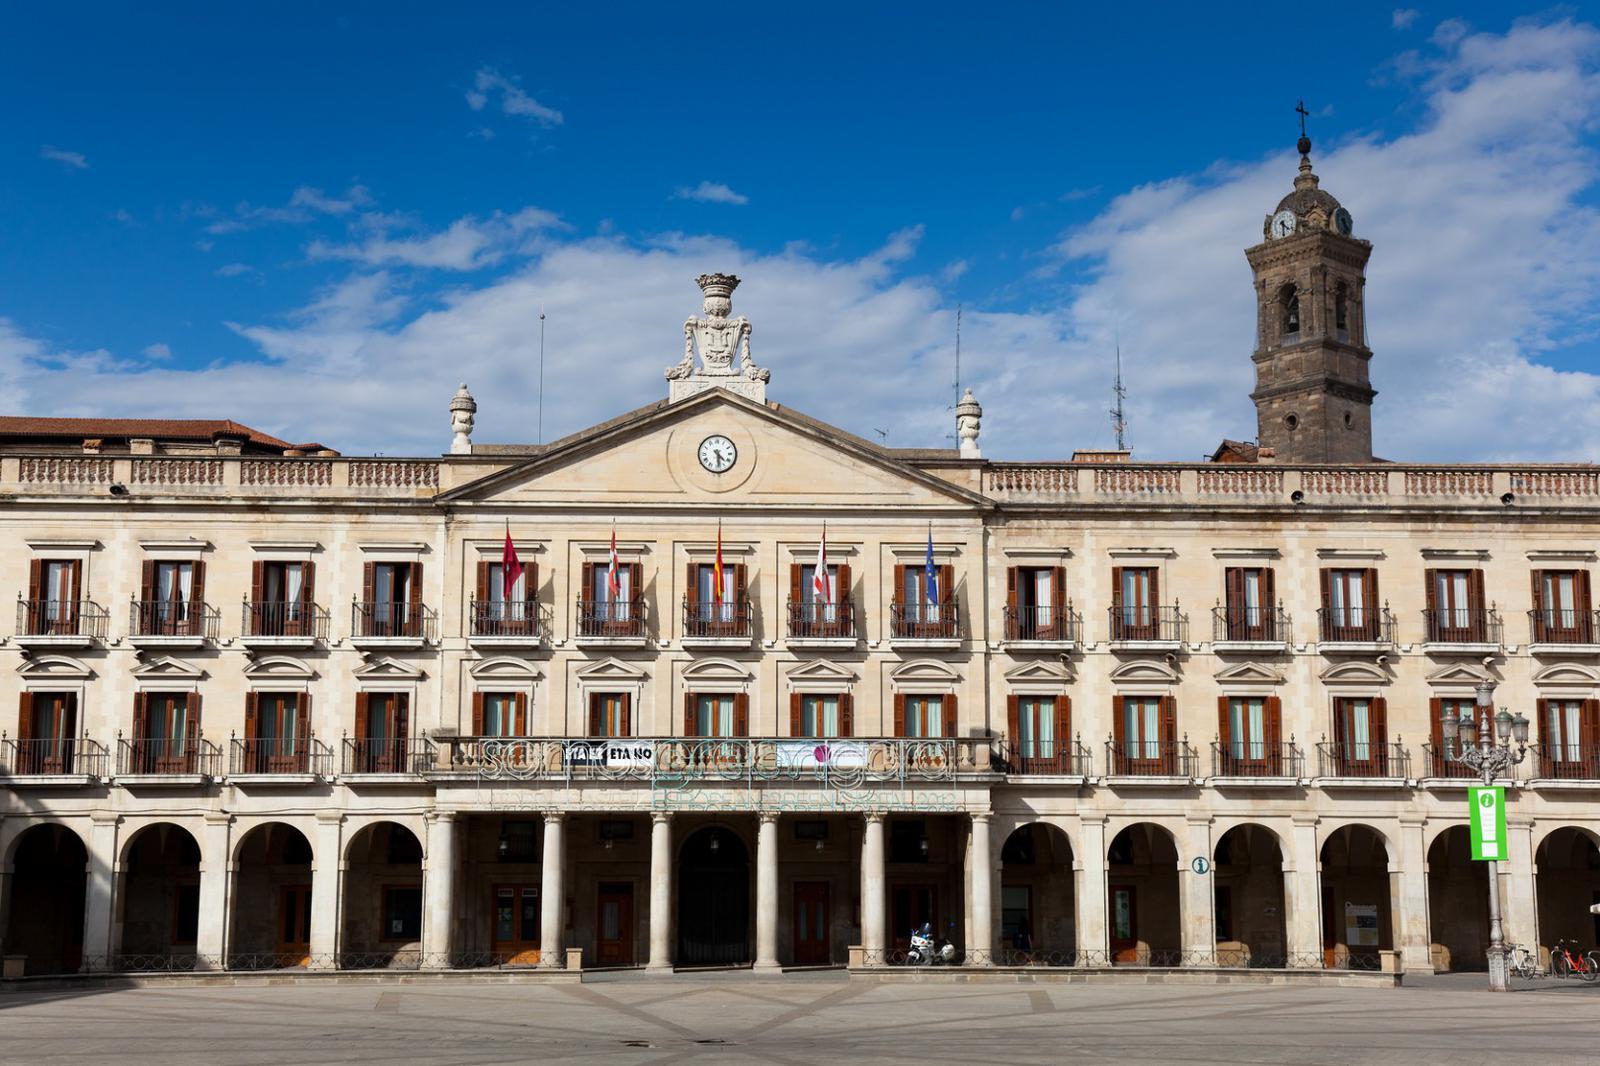 City council, New square, Vitoria, Alava, Basque Country, Spain